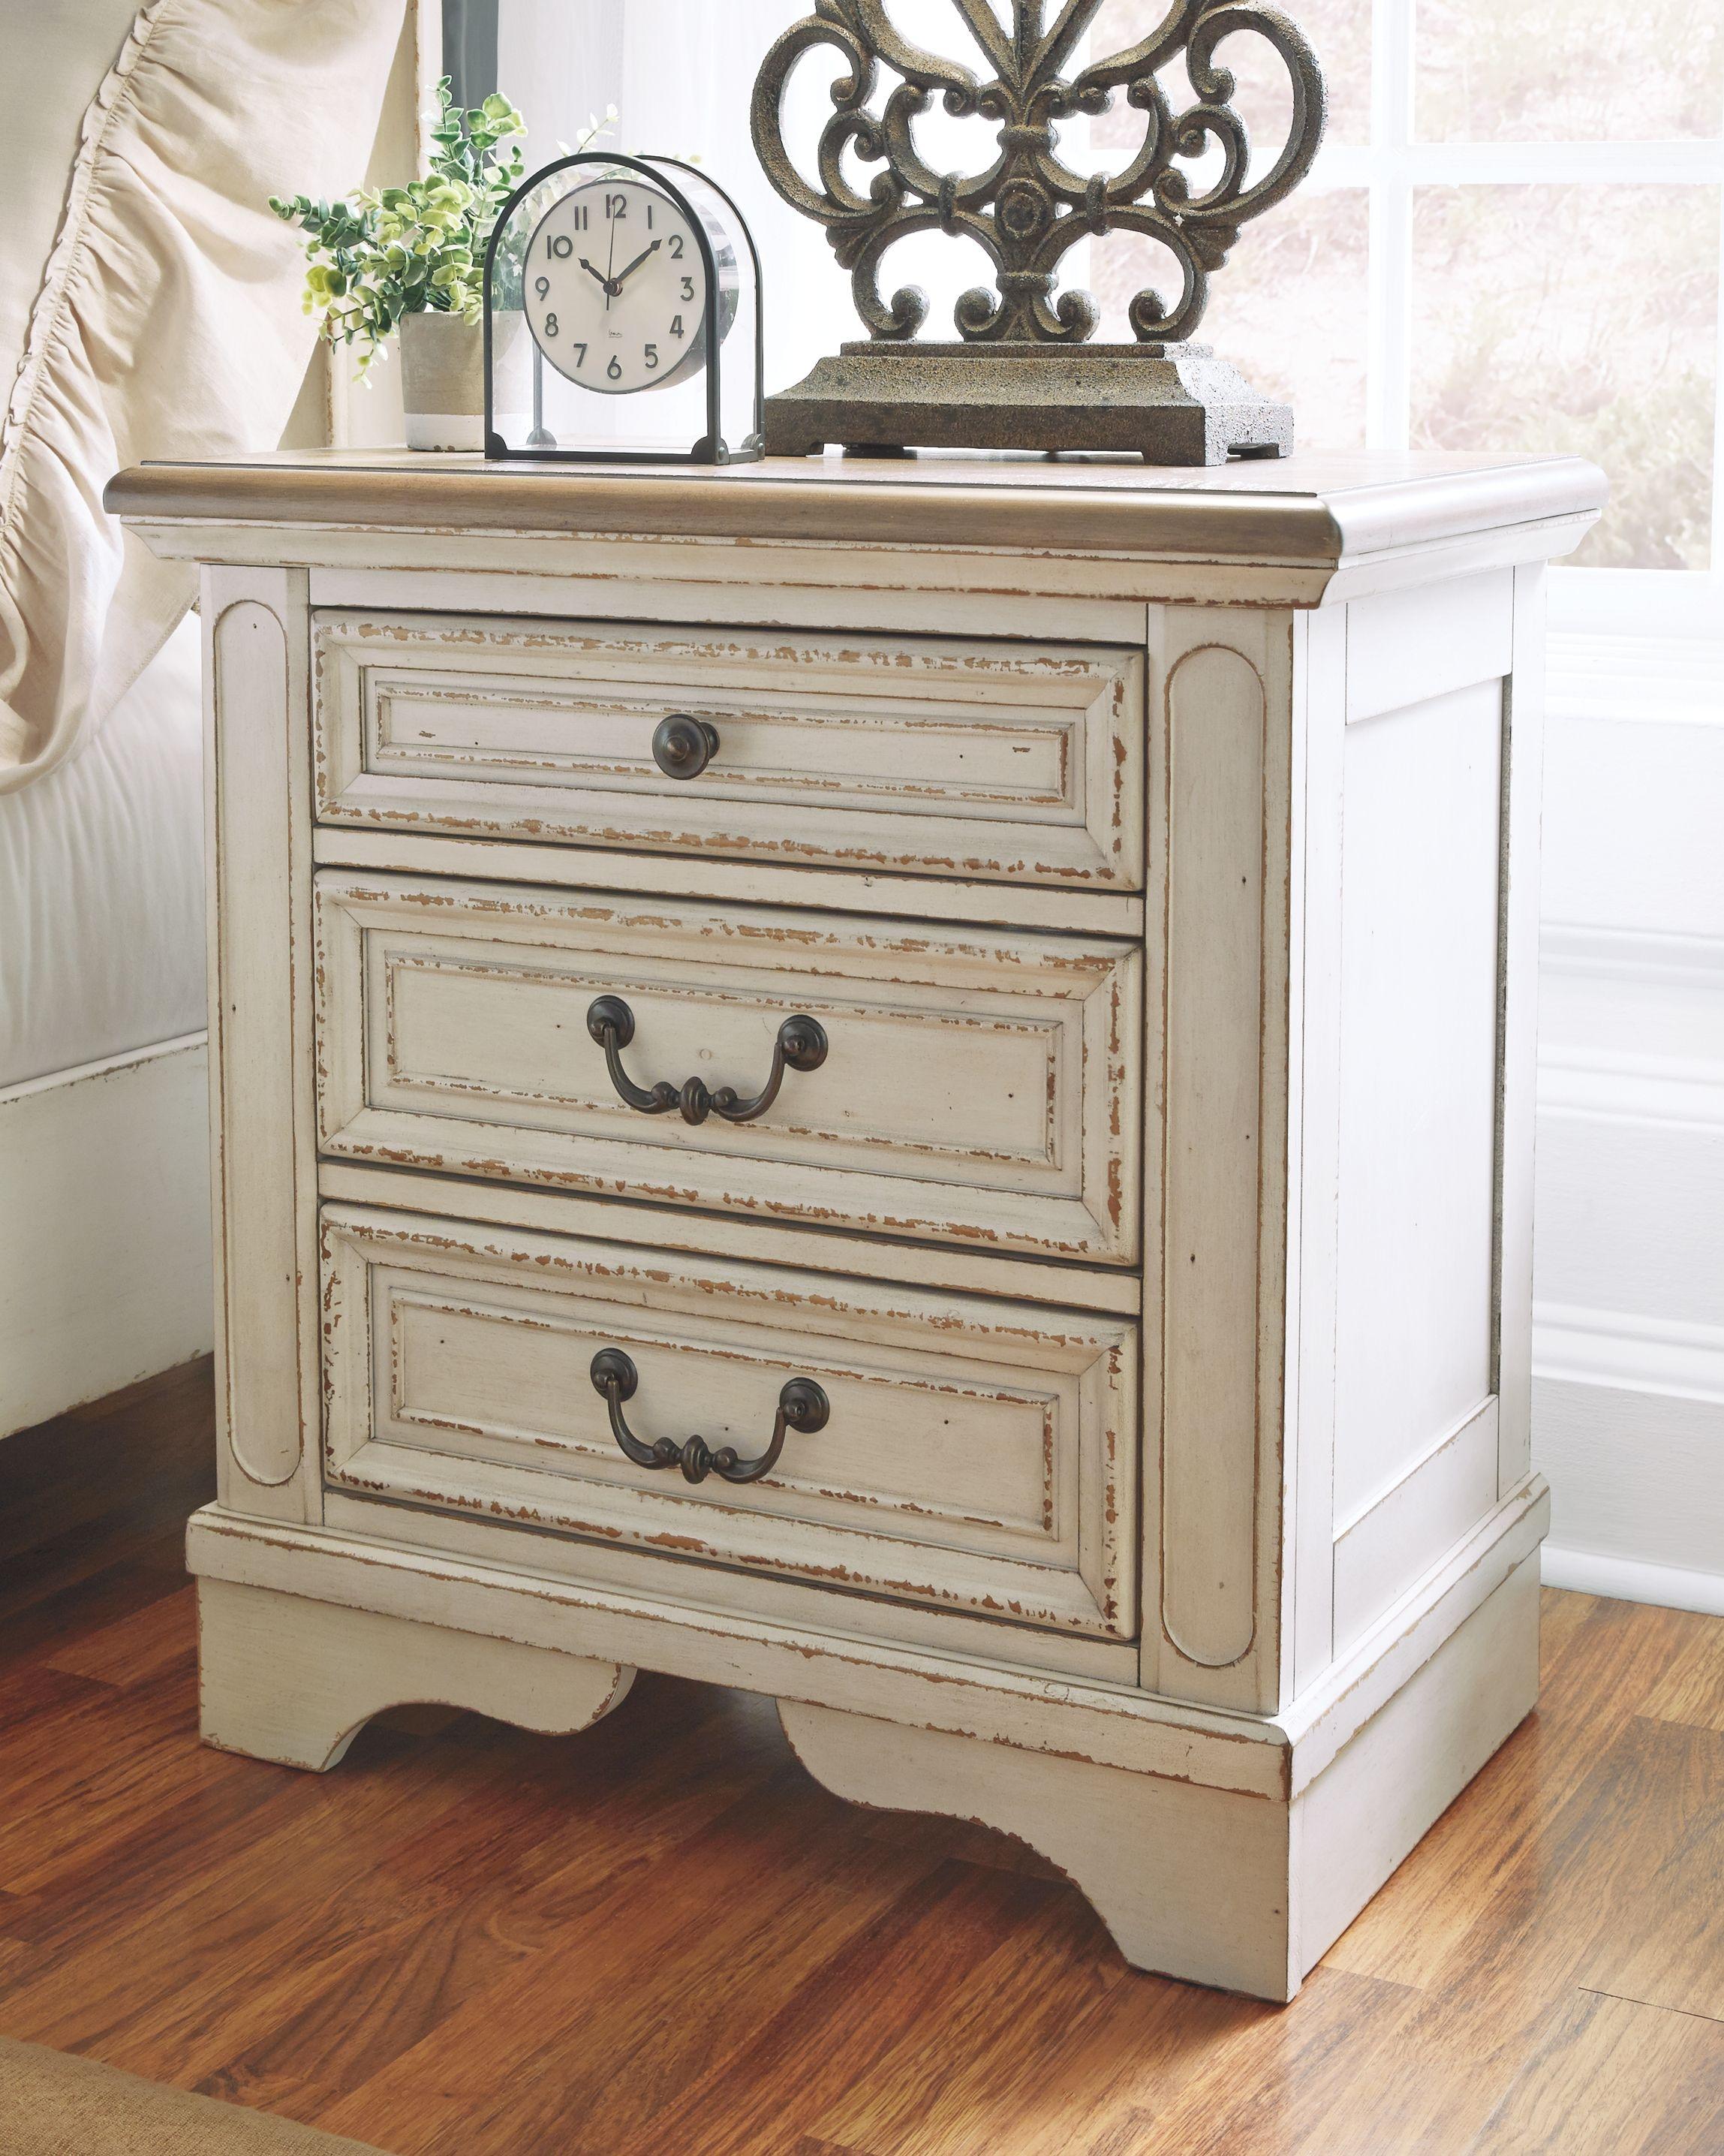 Realyn Nightstand | Shabby chic dresser, Furniture, Shabby